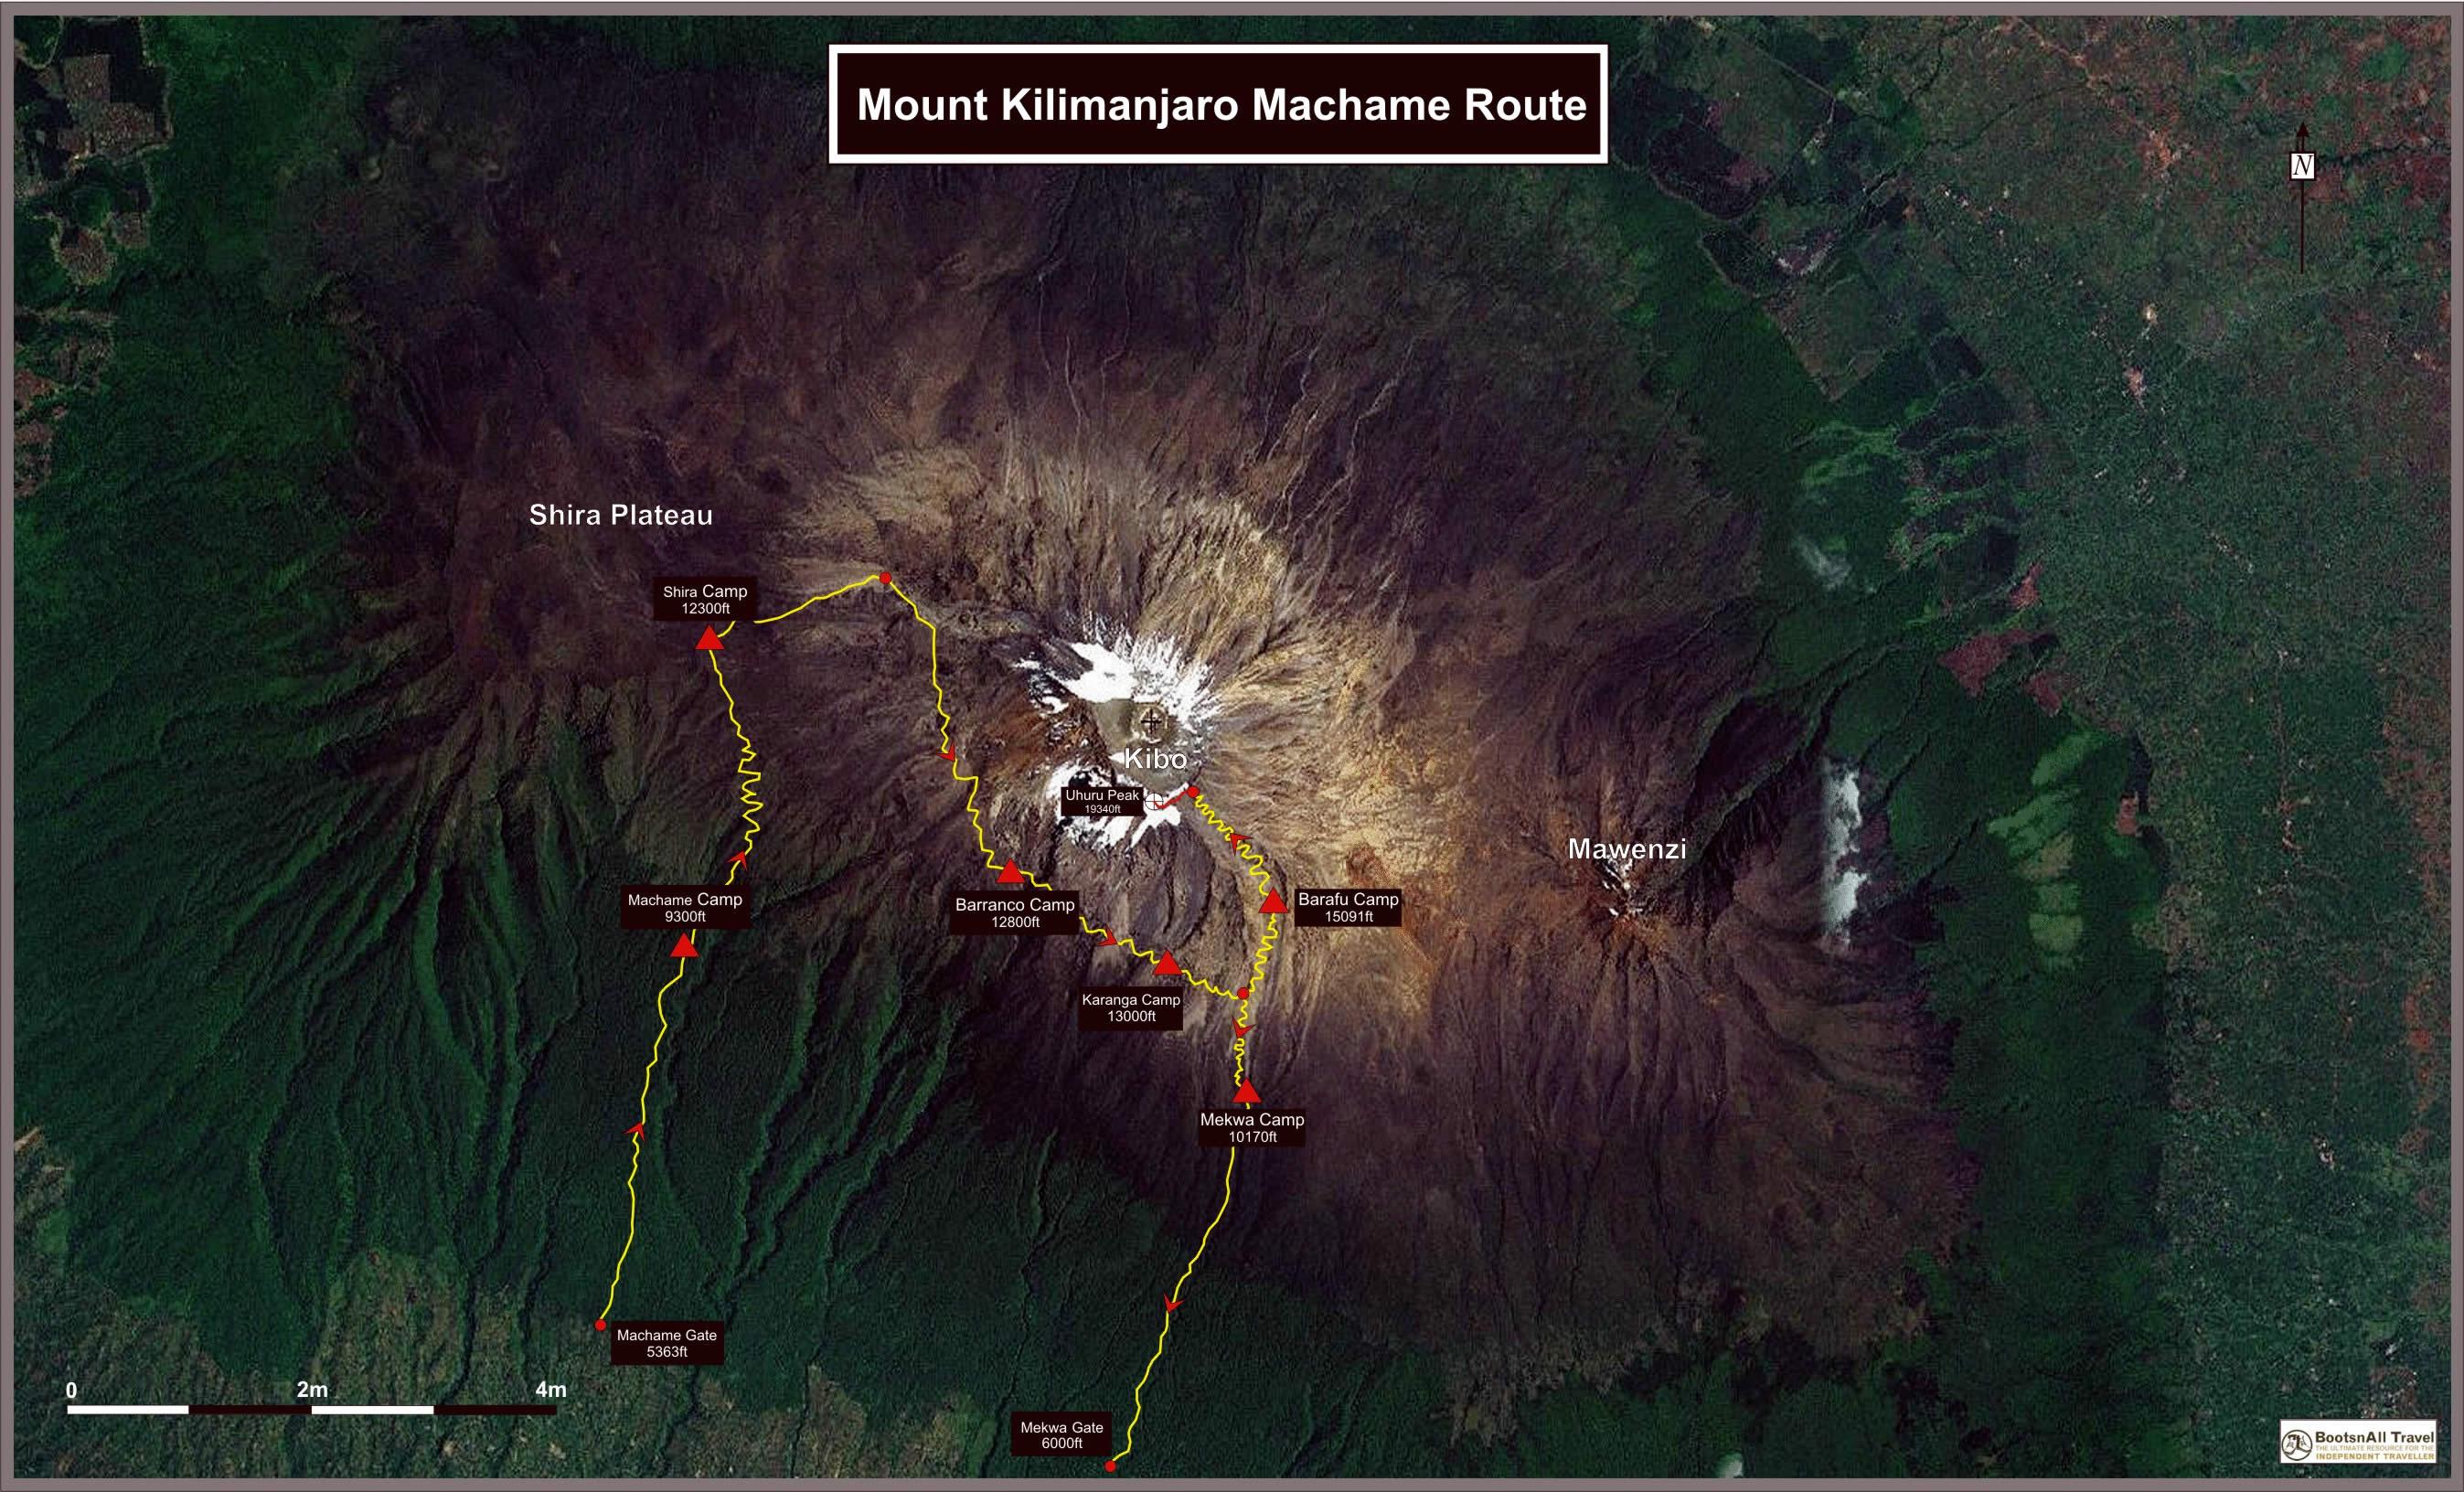 kilimanjaro-machame-route.jpg